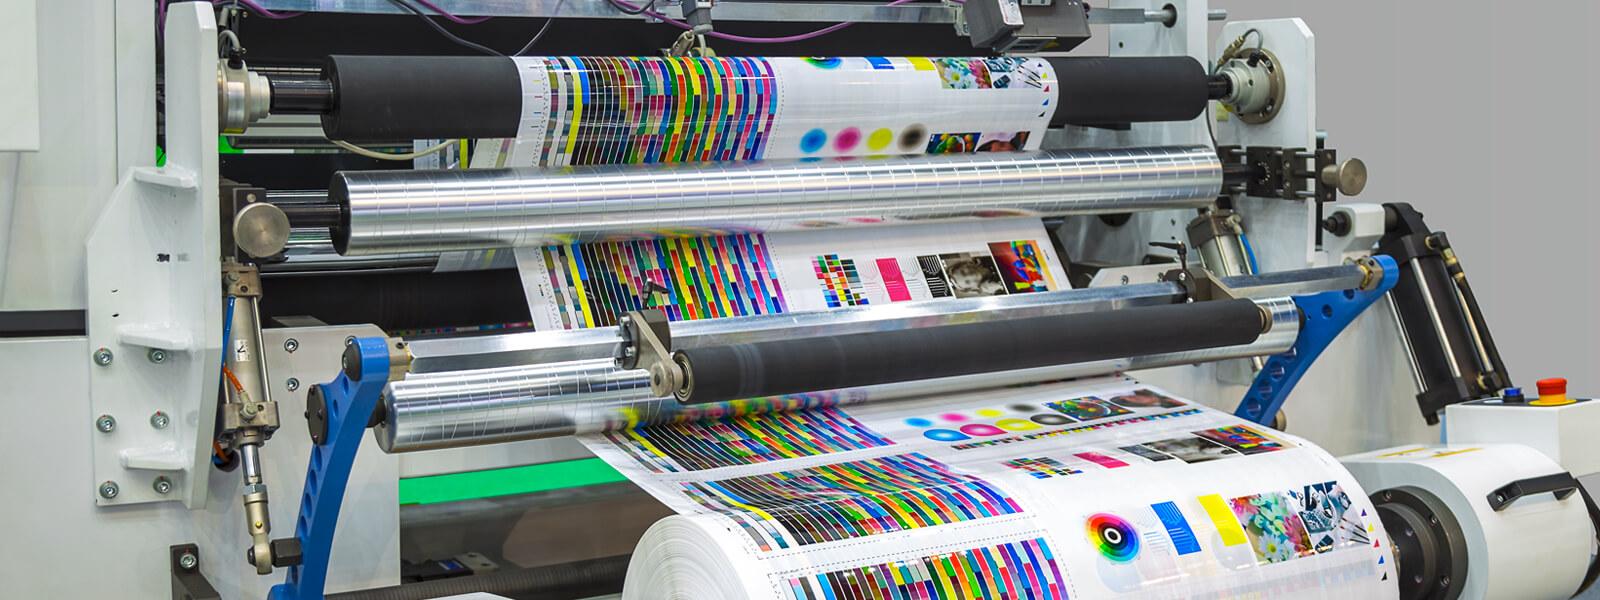 printer services gold coast image 1